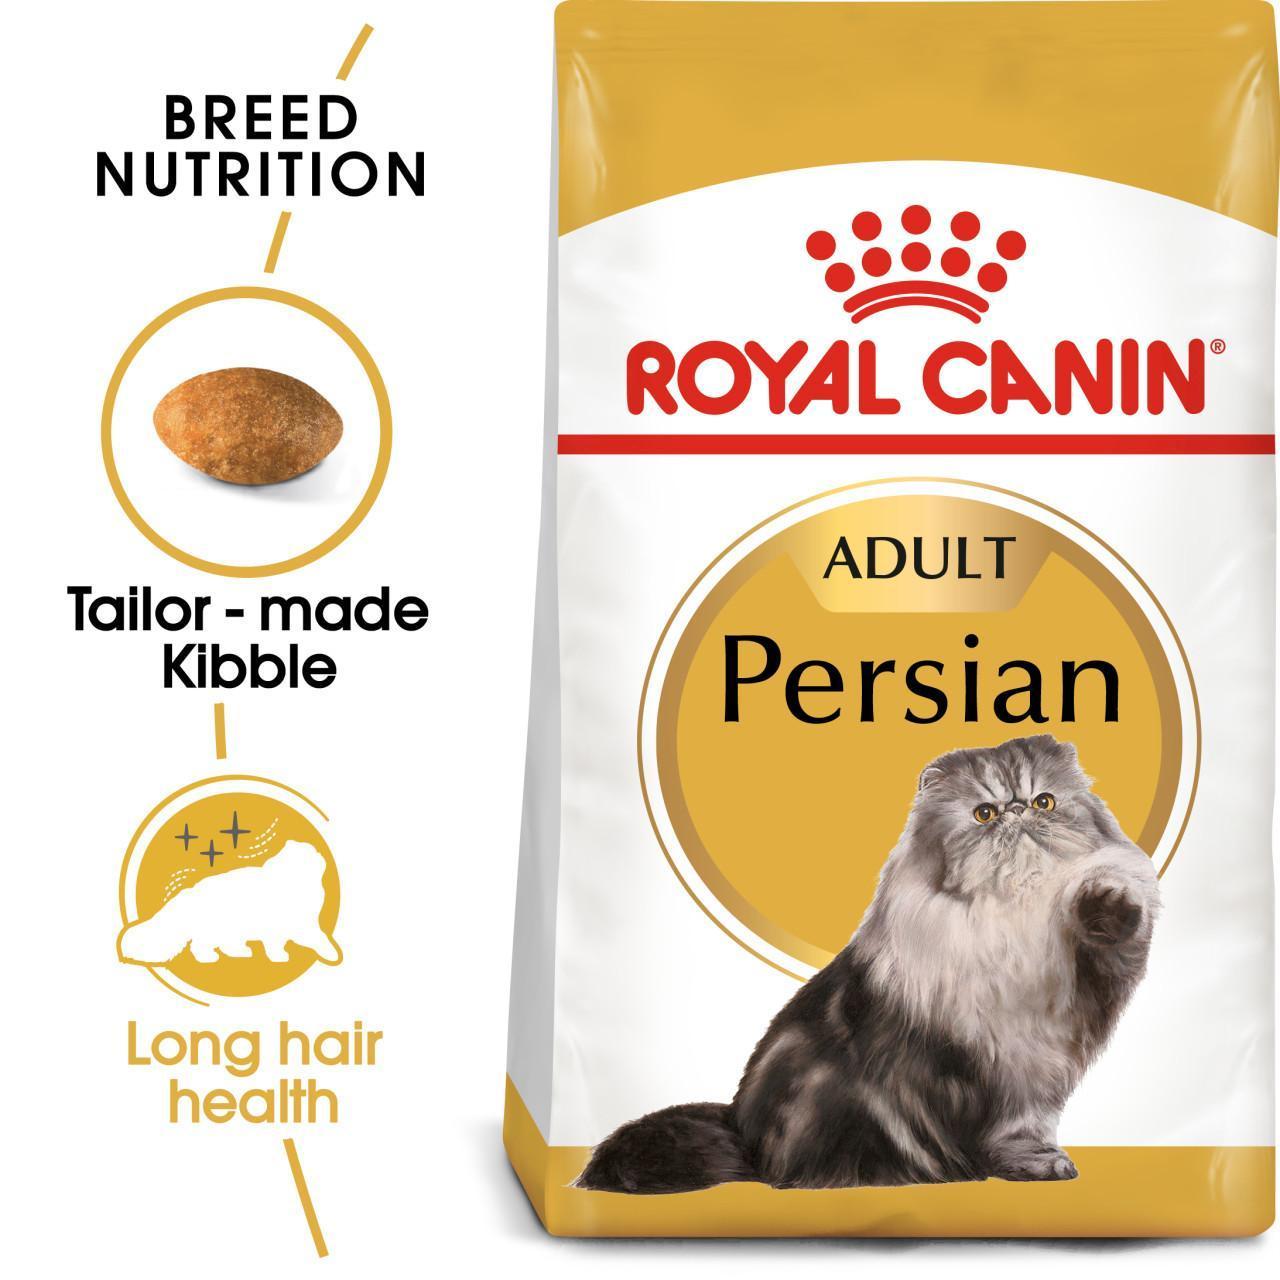 An image of Royal Canin Feline Persian